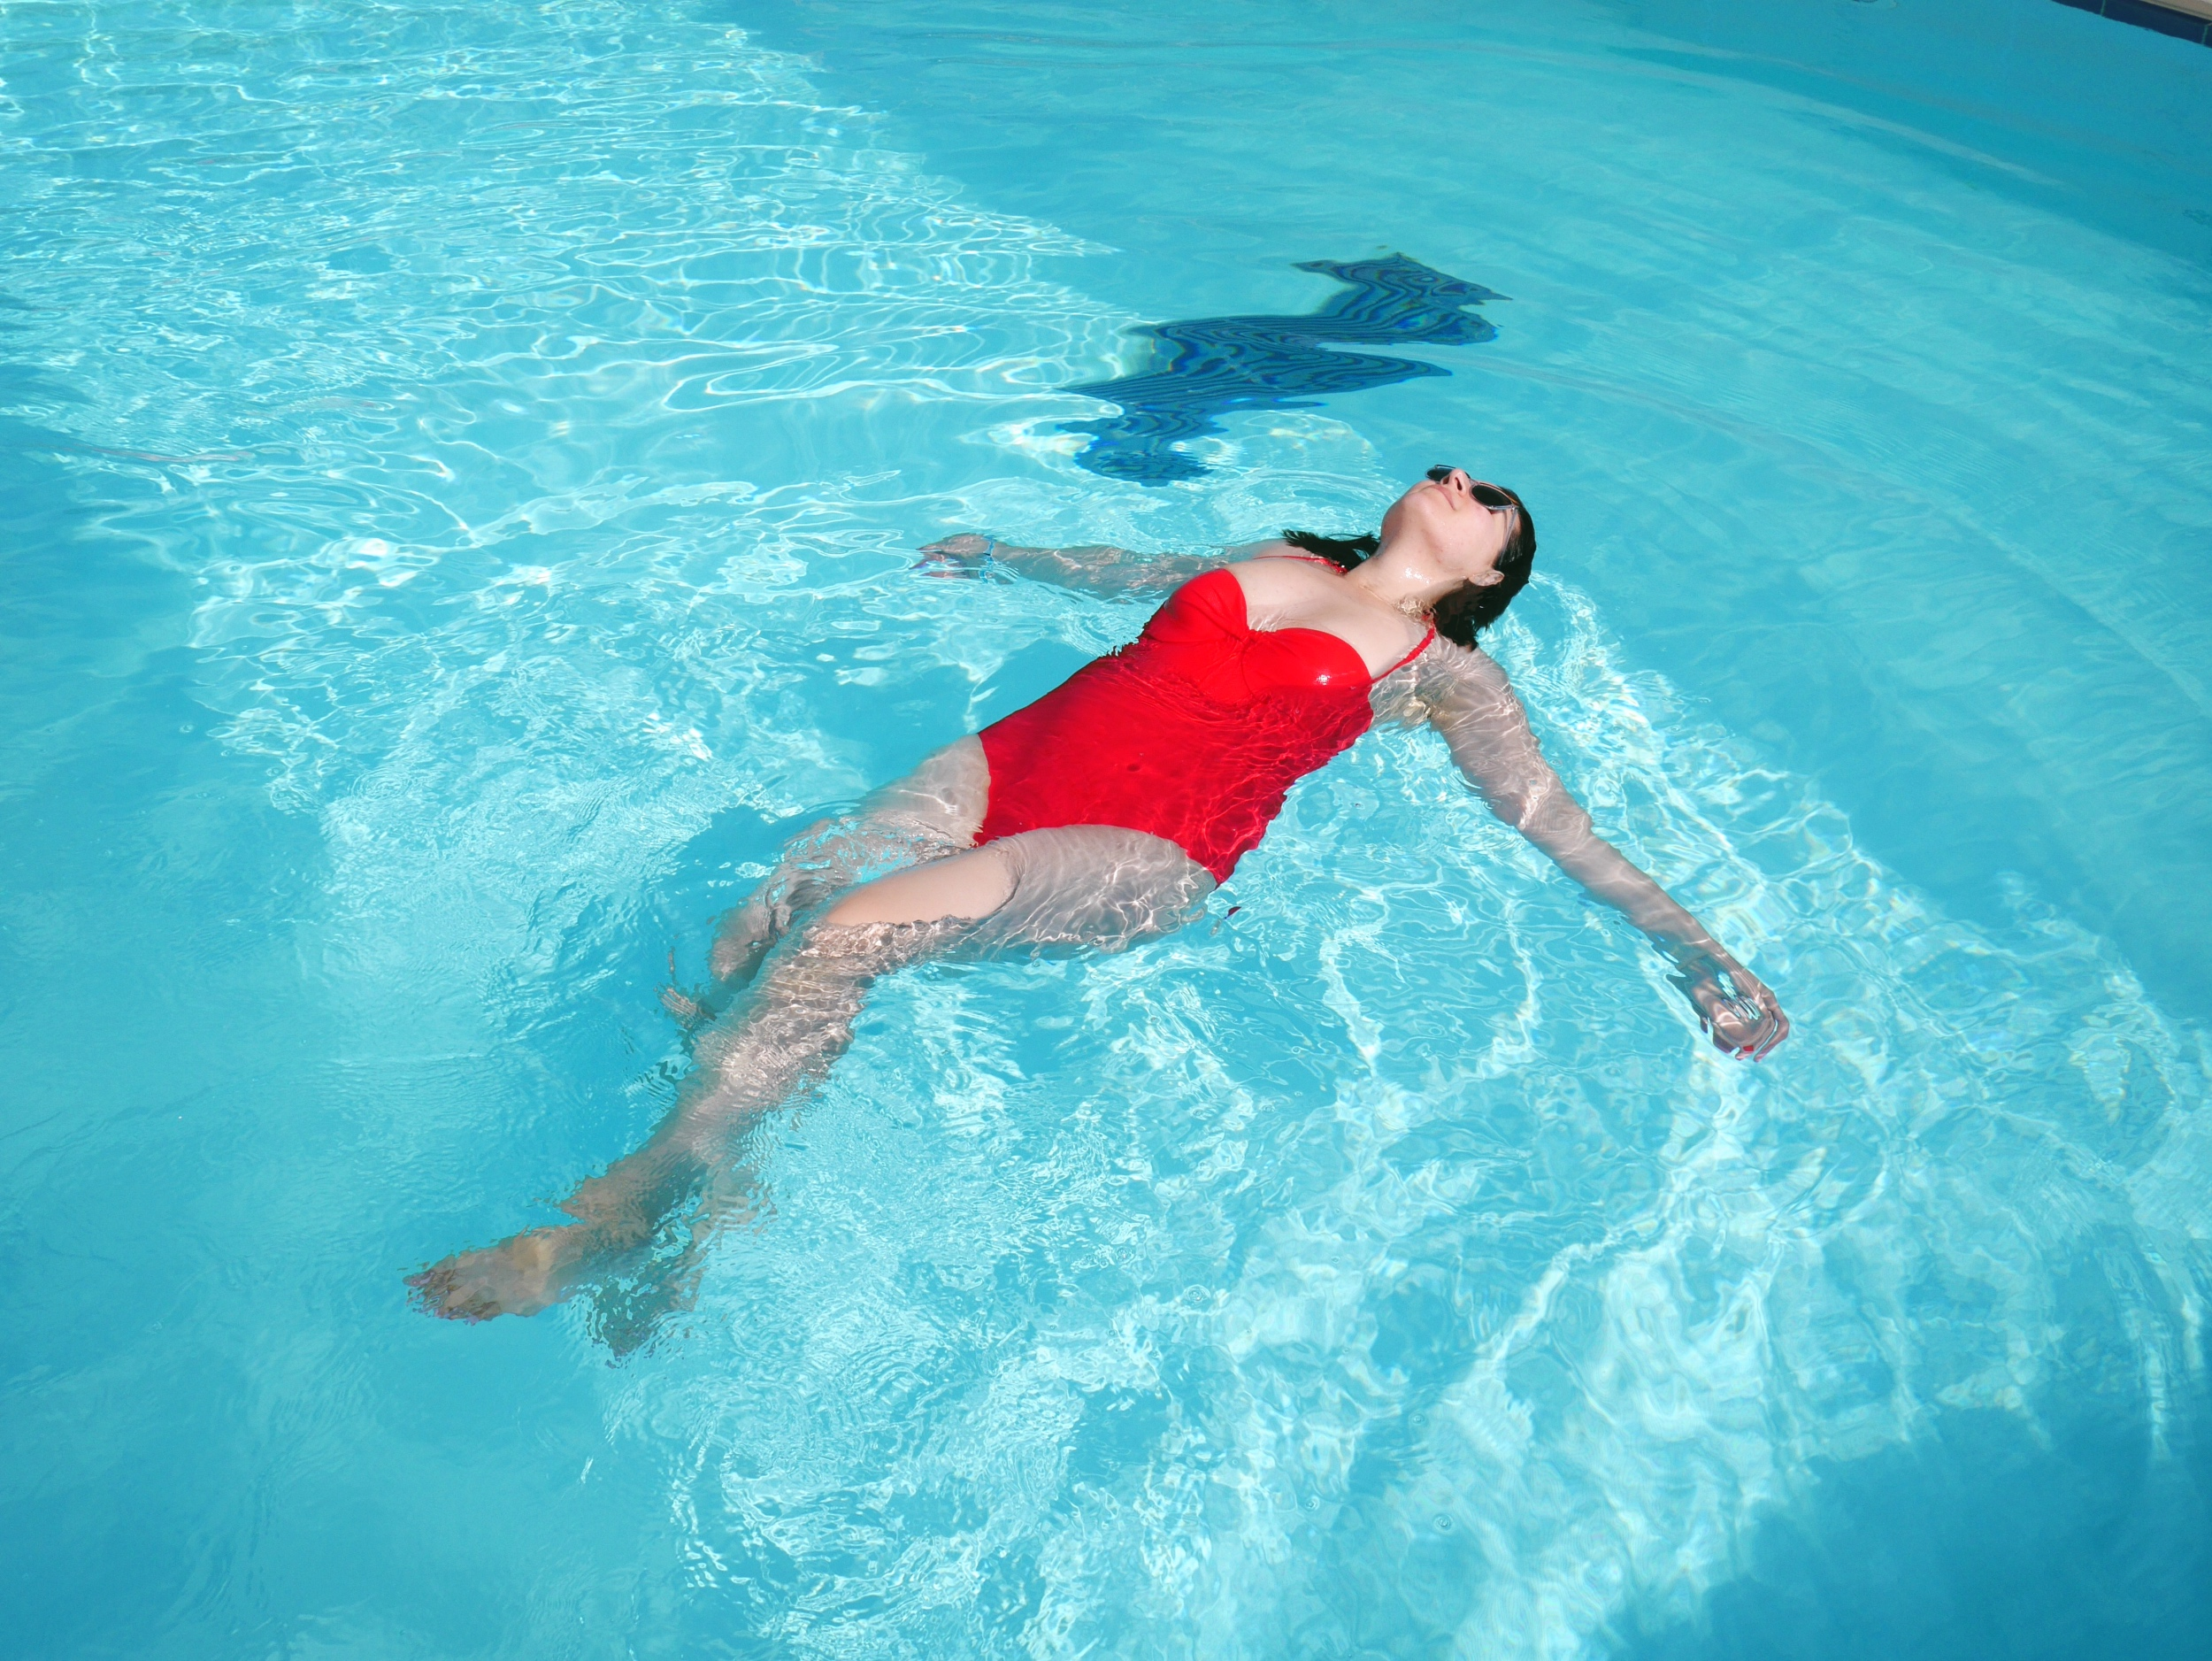 piscine maillot de bain rouge